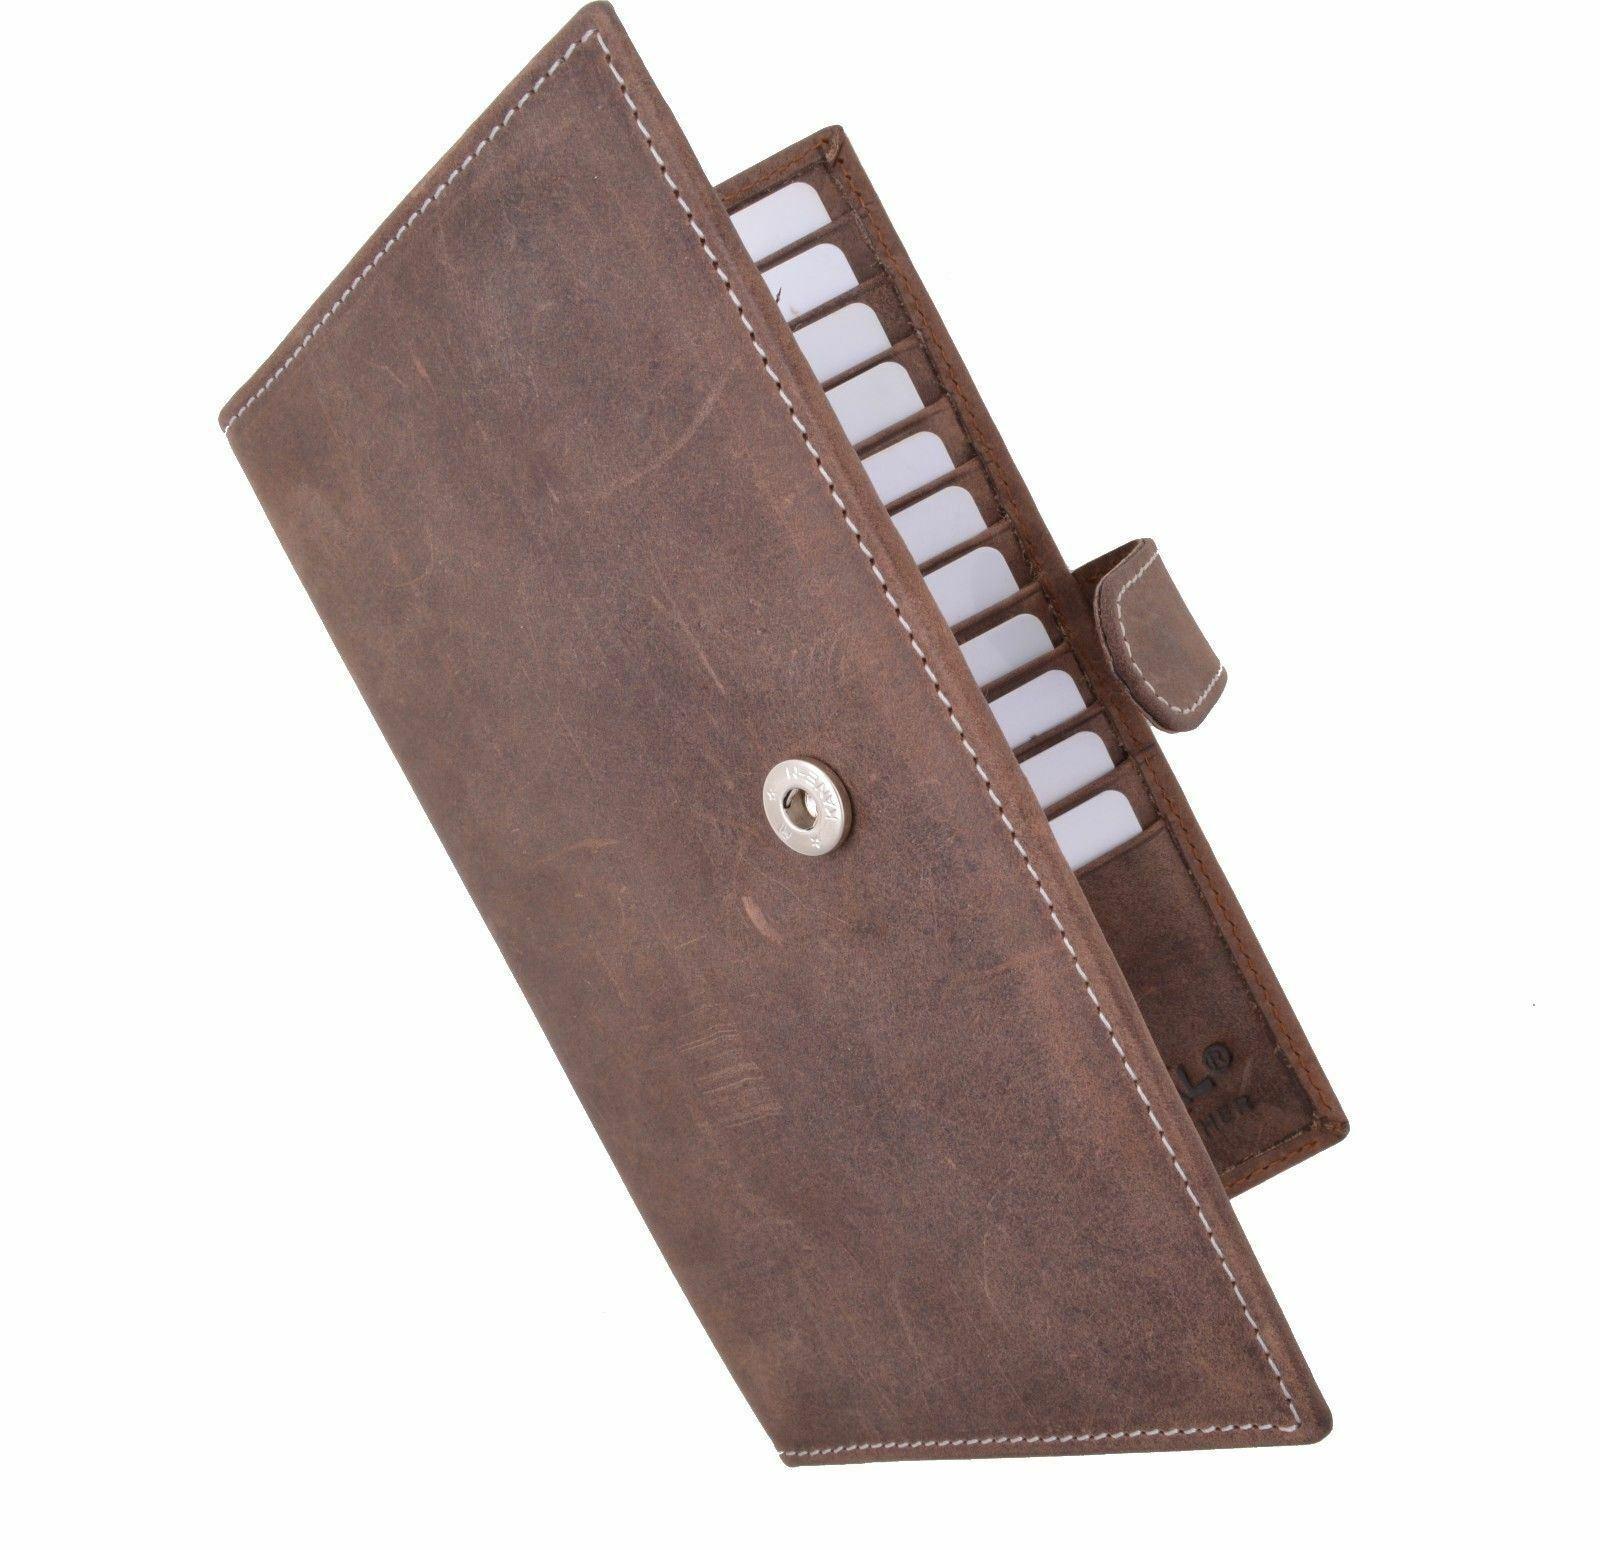 Men's RFID Blocking Soft Vintage Leather Bifold Credit Card Holder with Closure